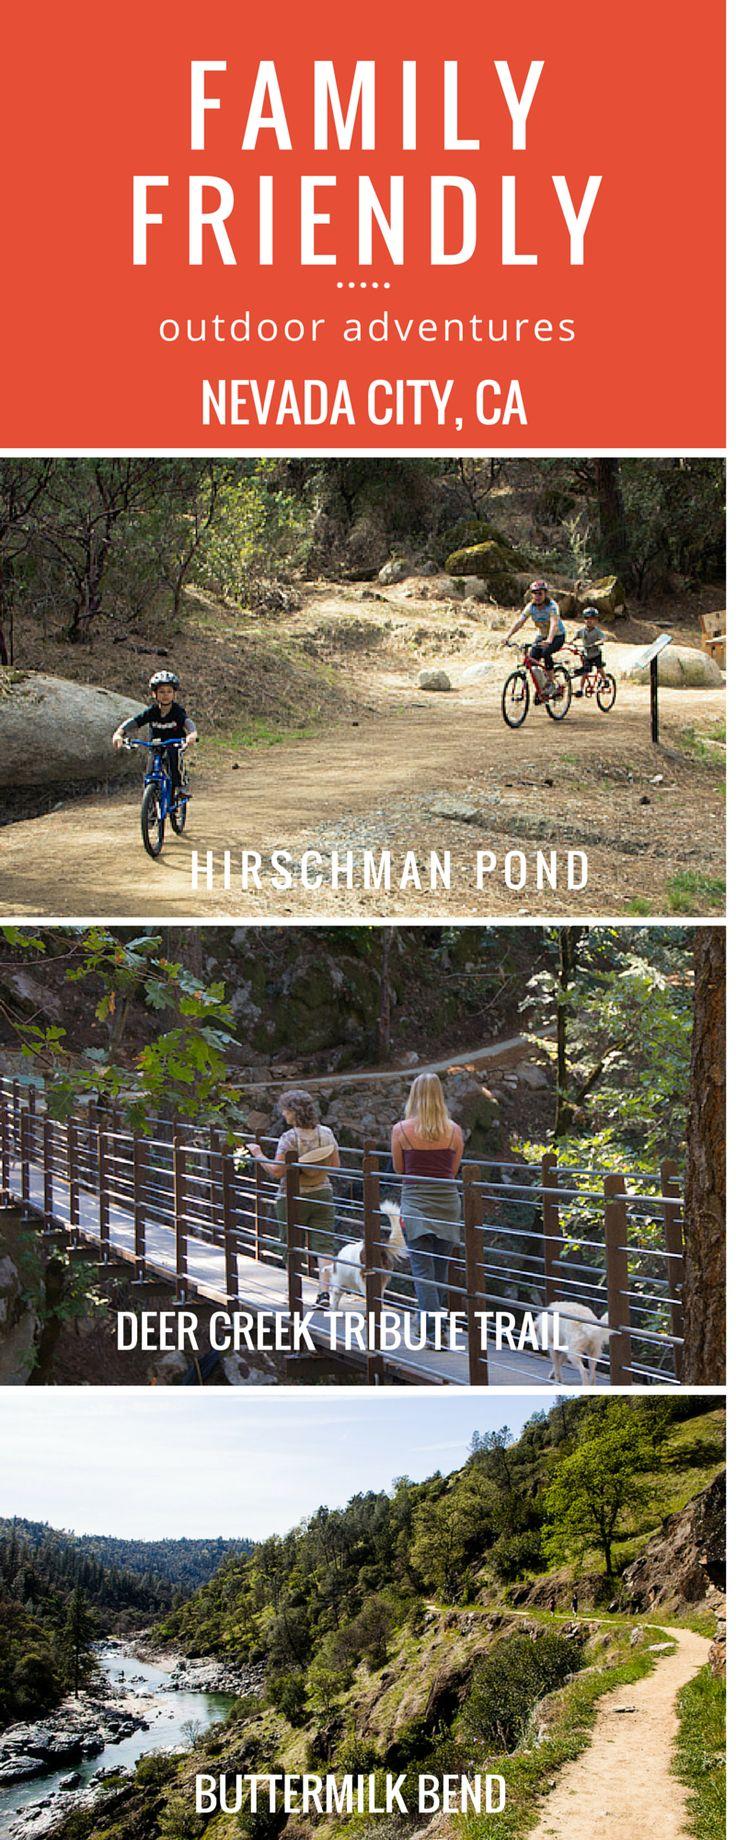 Family Friendly outdoor adventures in Nevada City, California.  Hirschman Pond, Deer Creek Tribute Trail, Buttermilk Bend.